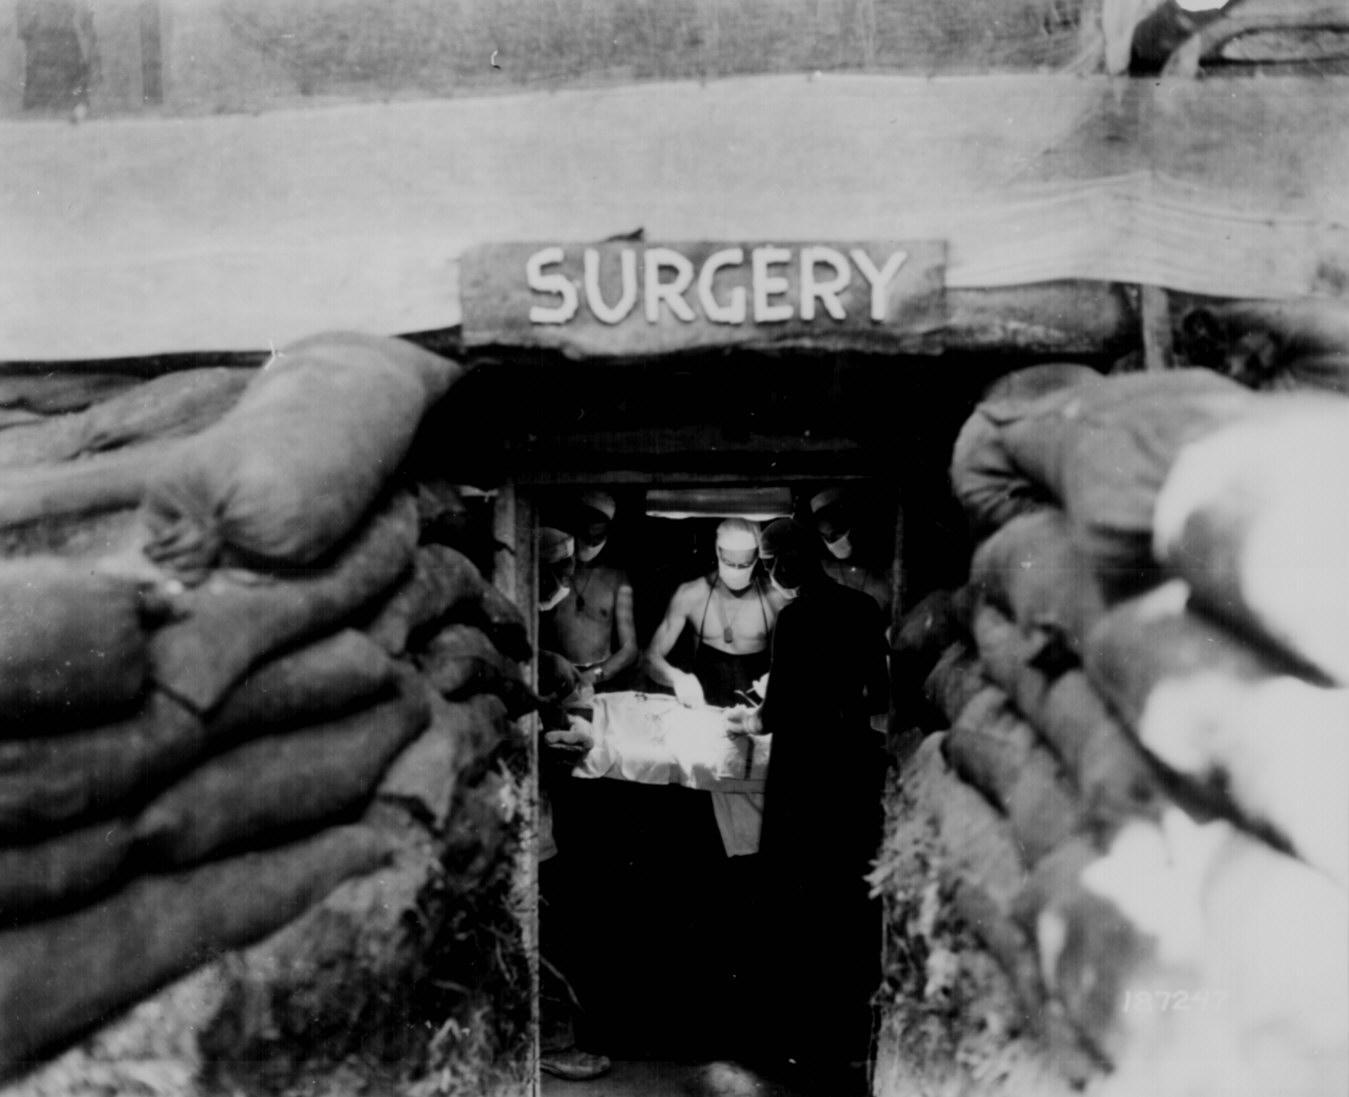 Battlefield Surgery in World War II